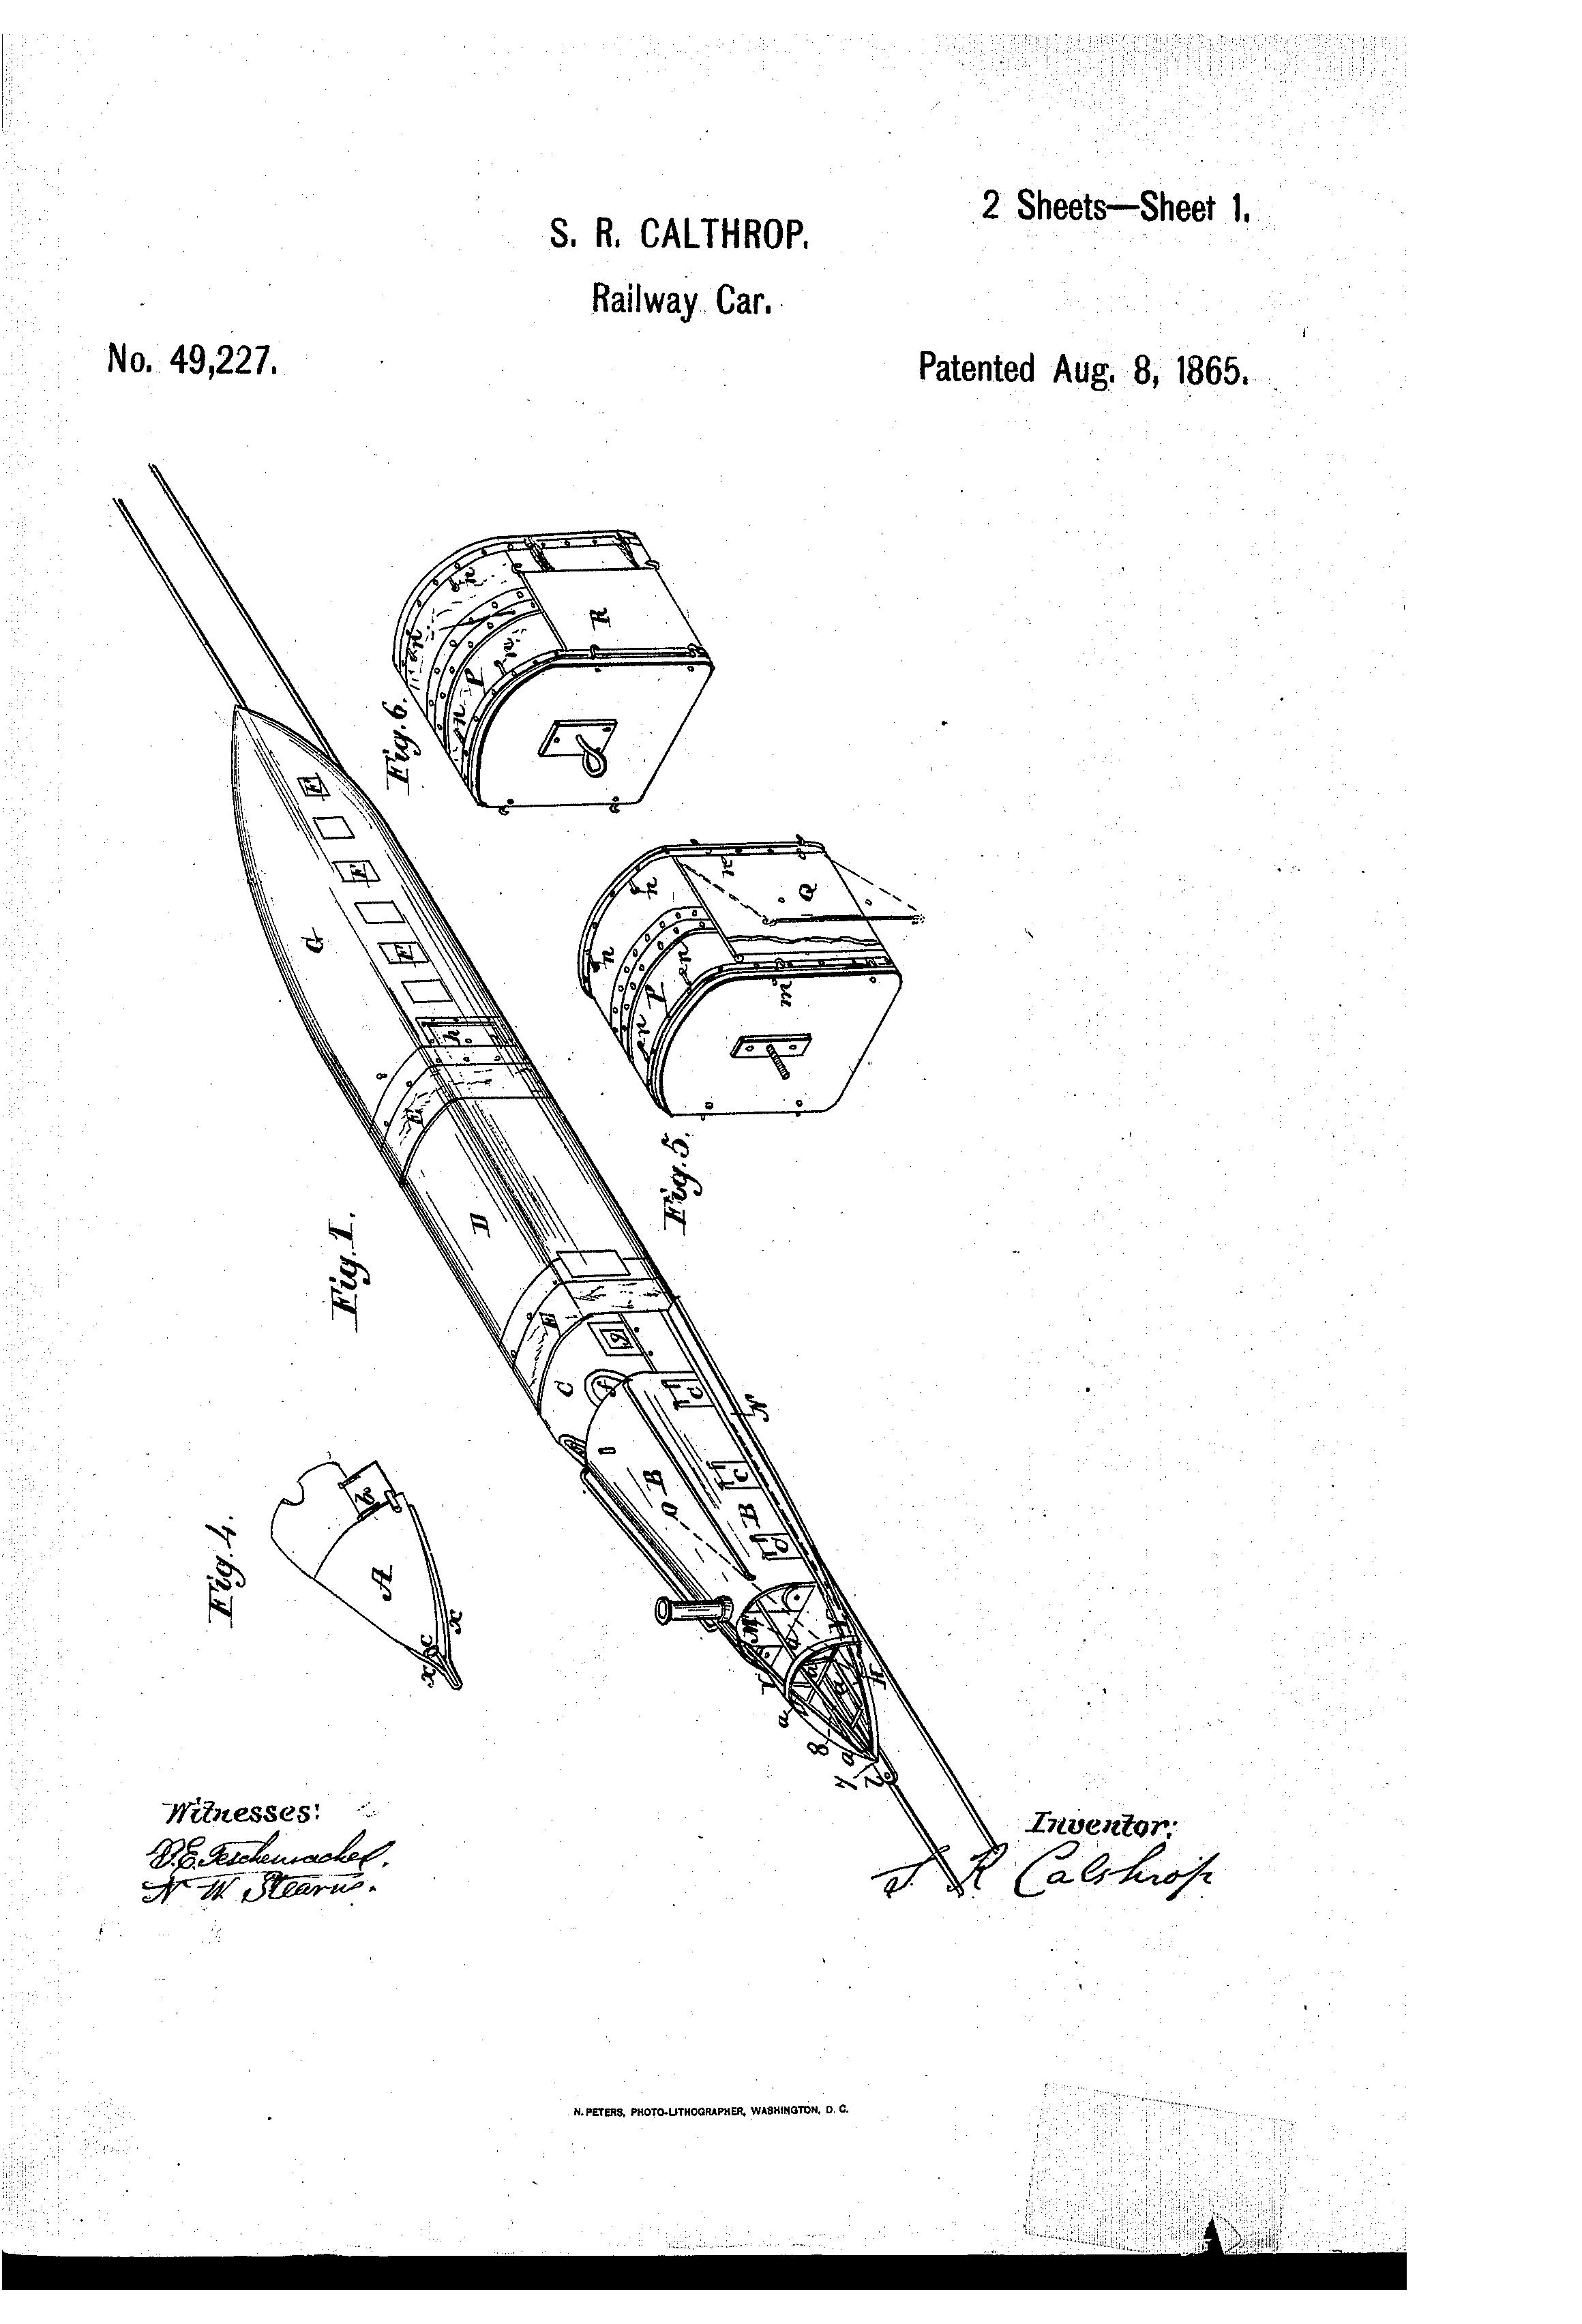 Streamlined 4-4-0 circa 1865